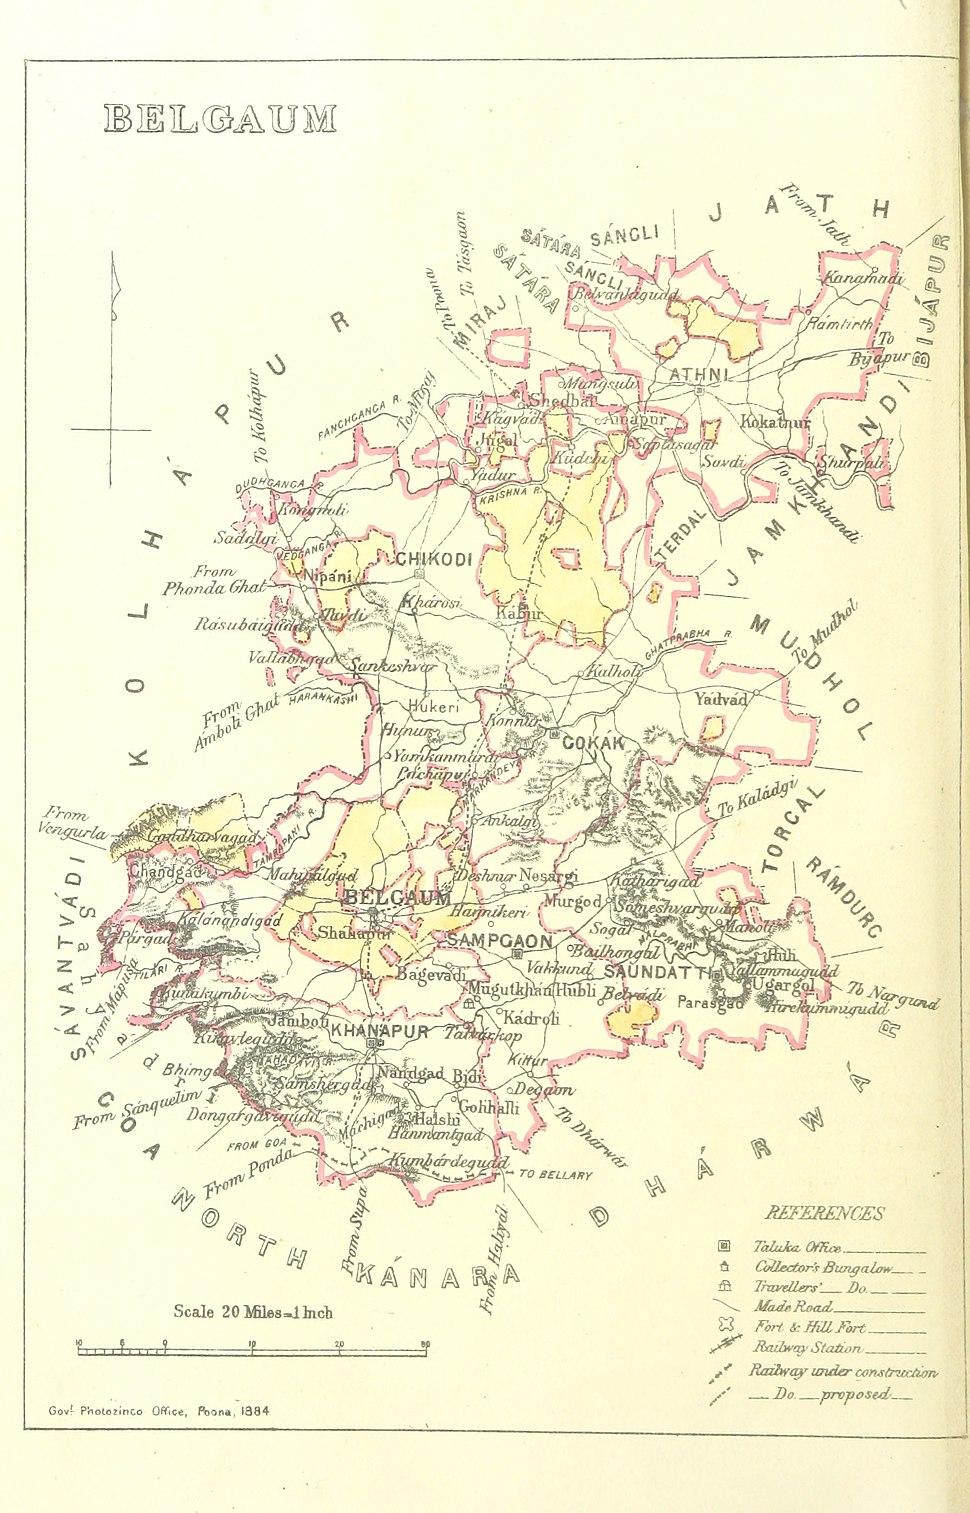 Belgaum 1896 map